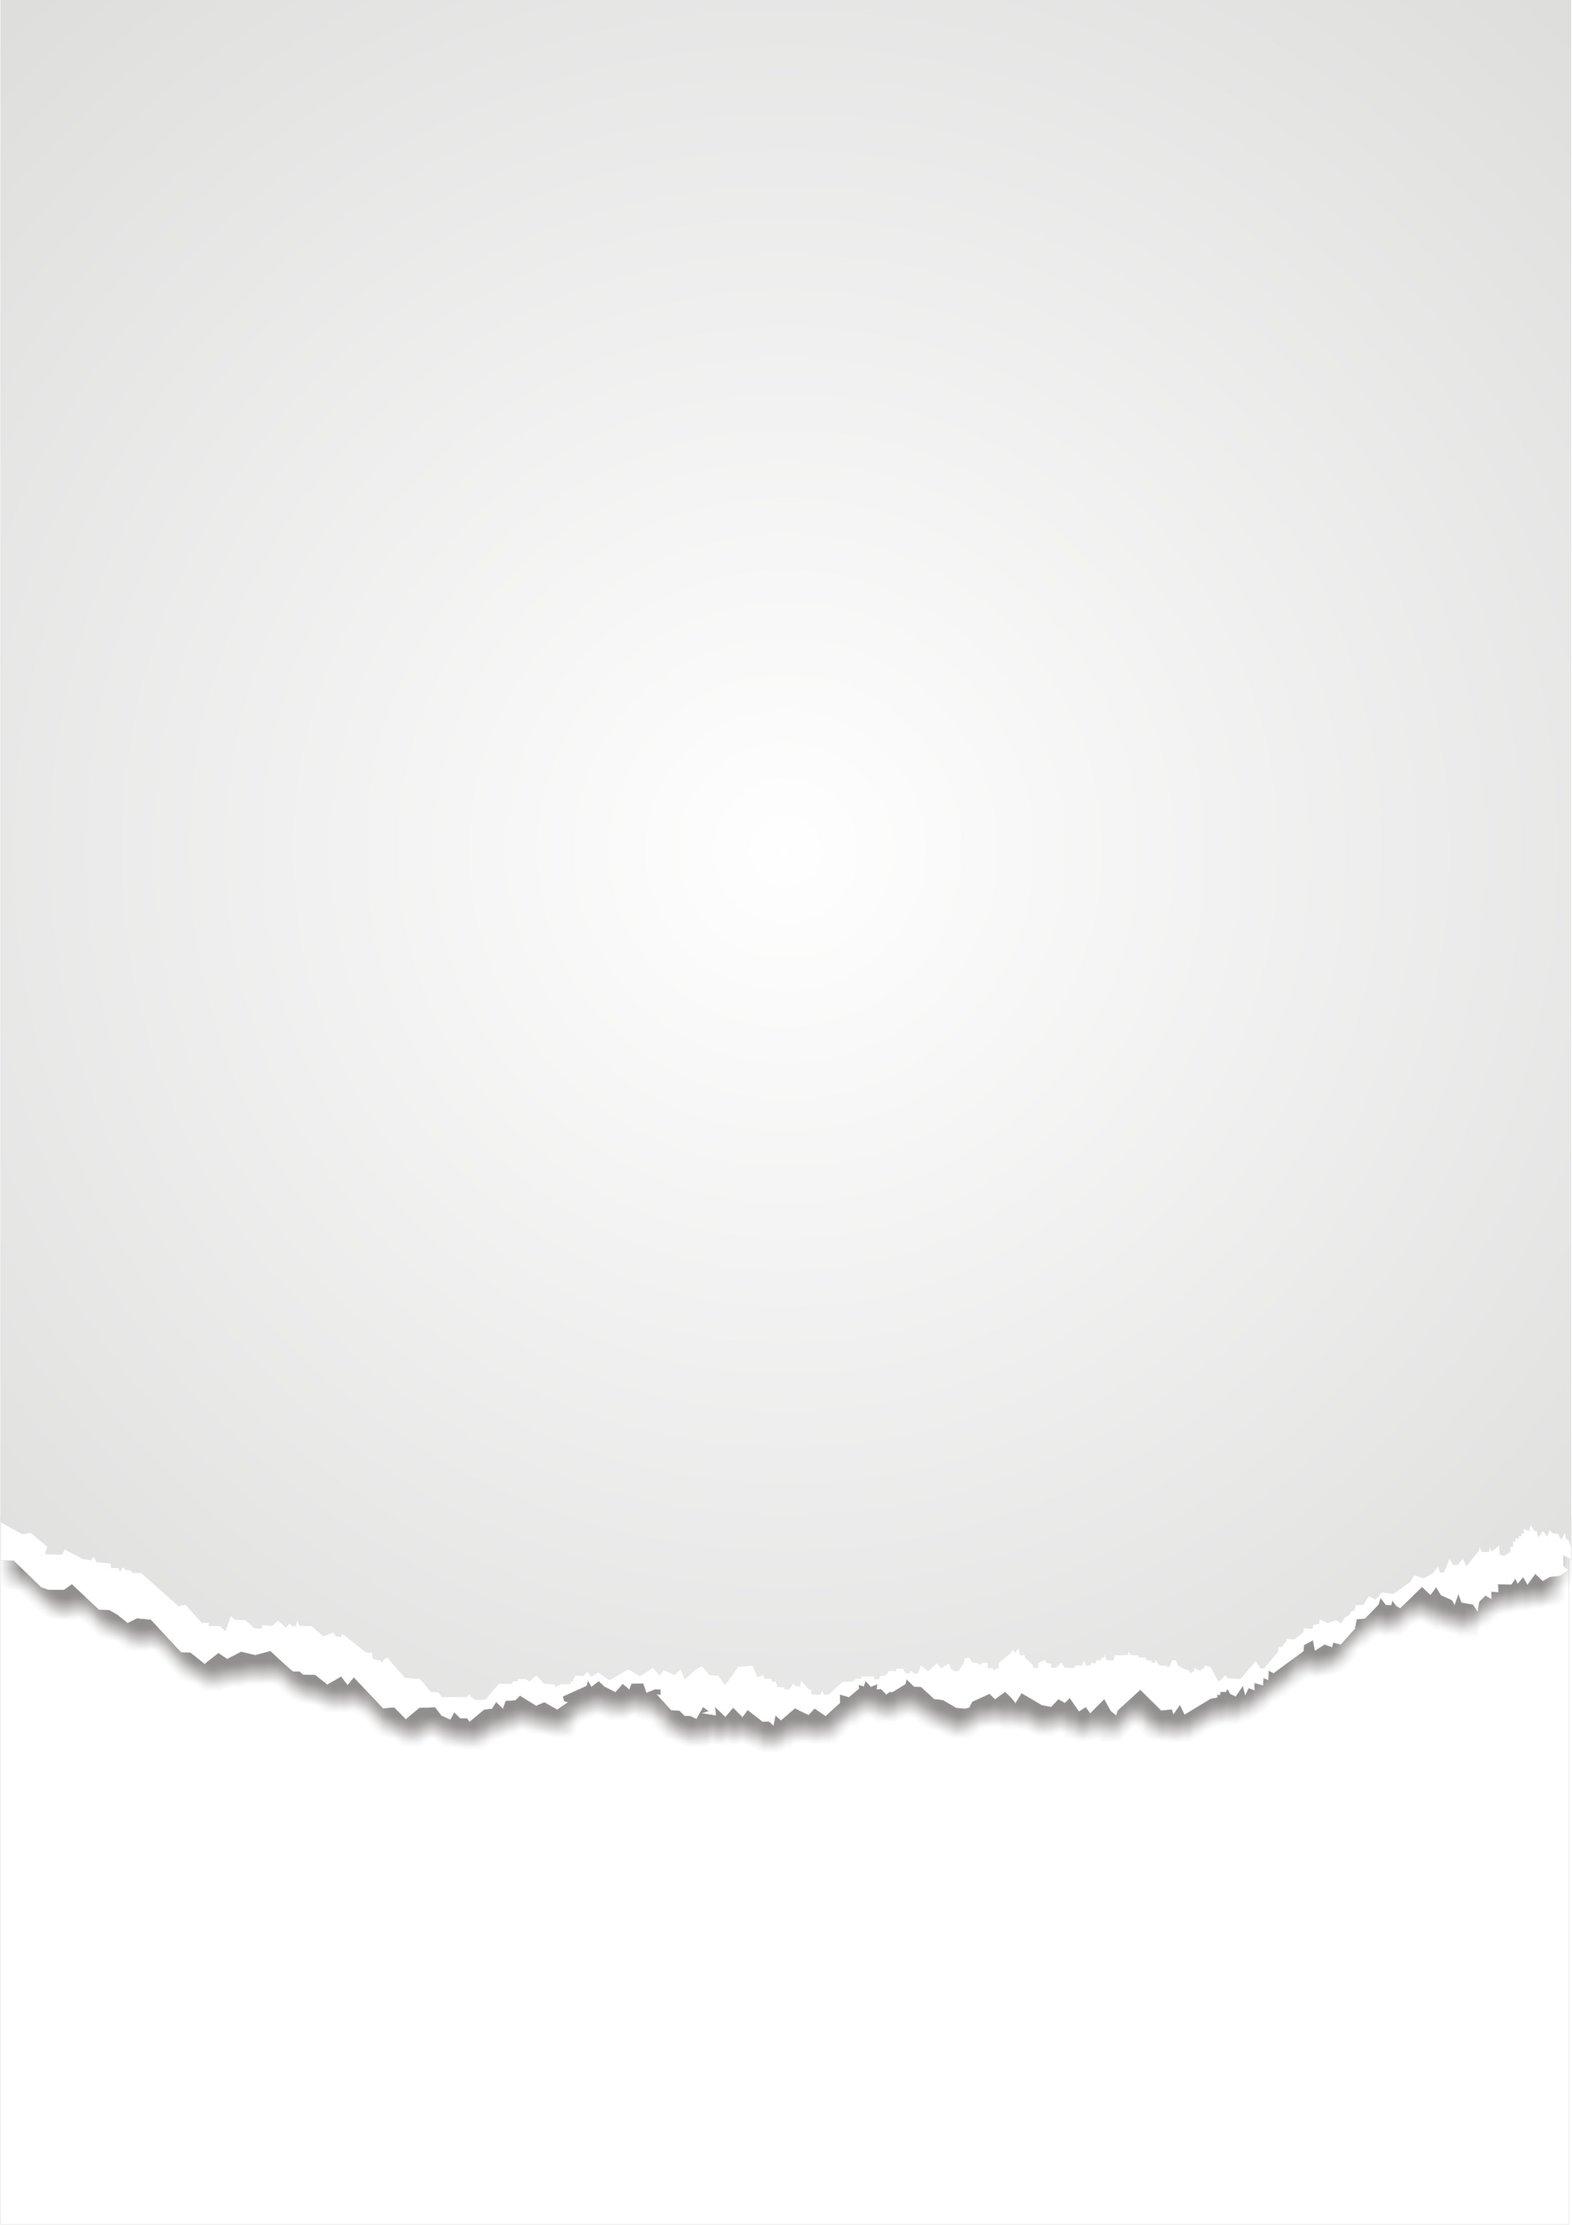 Paper rip clipart jpg transparent download Free Torn Paper, Download Free Clip Art, Free Clip Art on ... jpg transparent download